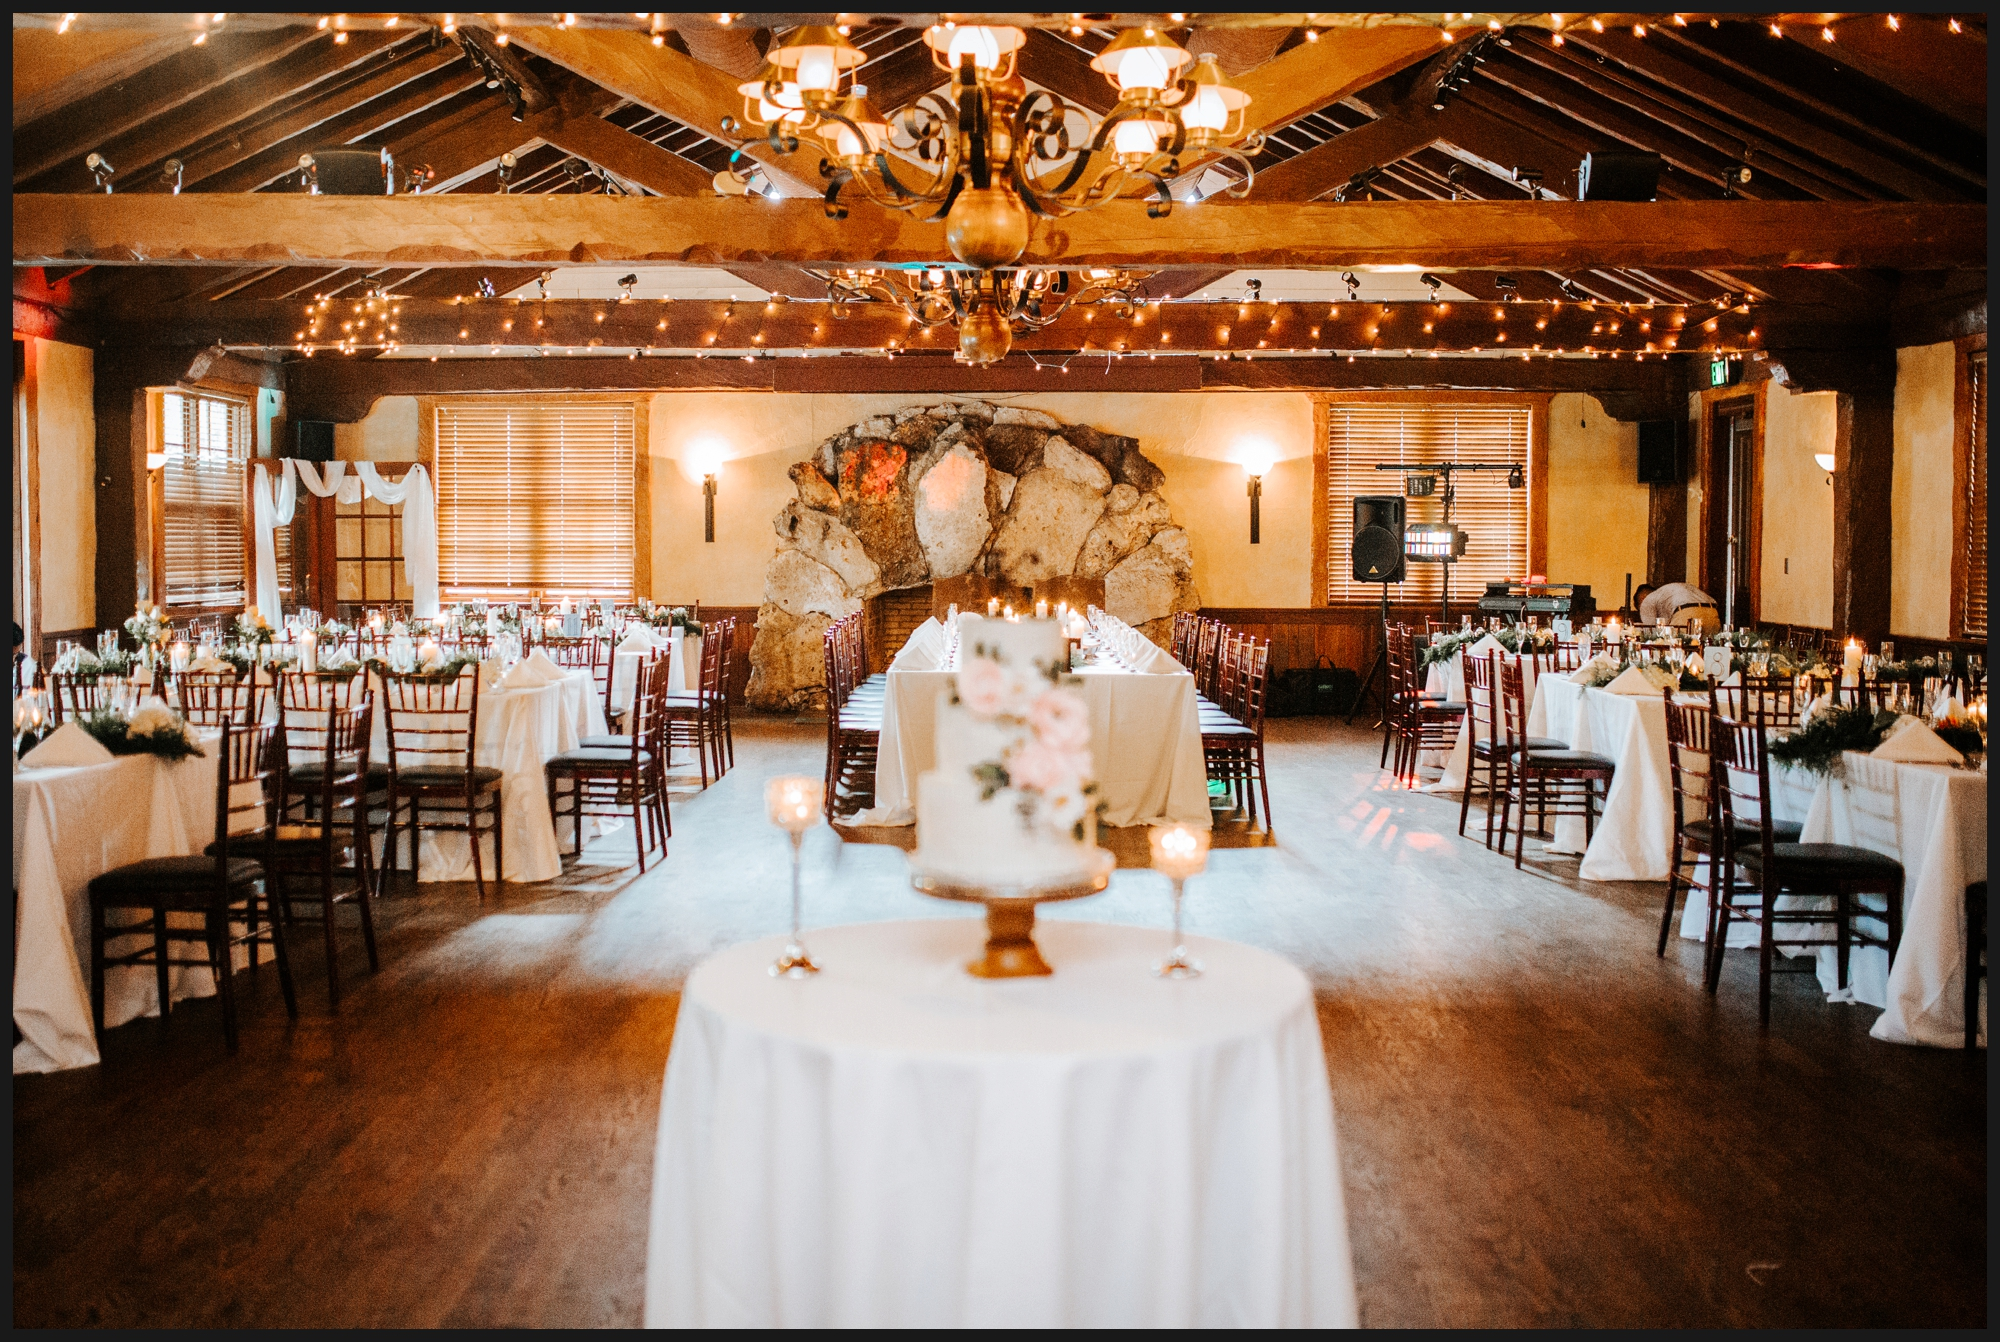 Orlando-Wedding-Photographer-destination-wedding-photographer-florida-wedding-photographer-bohemian-wedding-photographer_0080.jpg